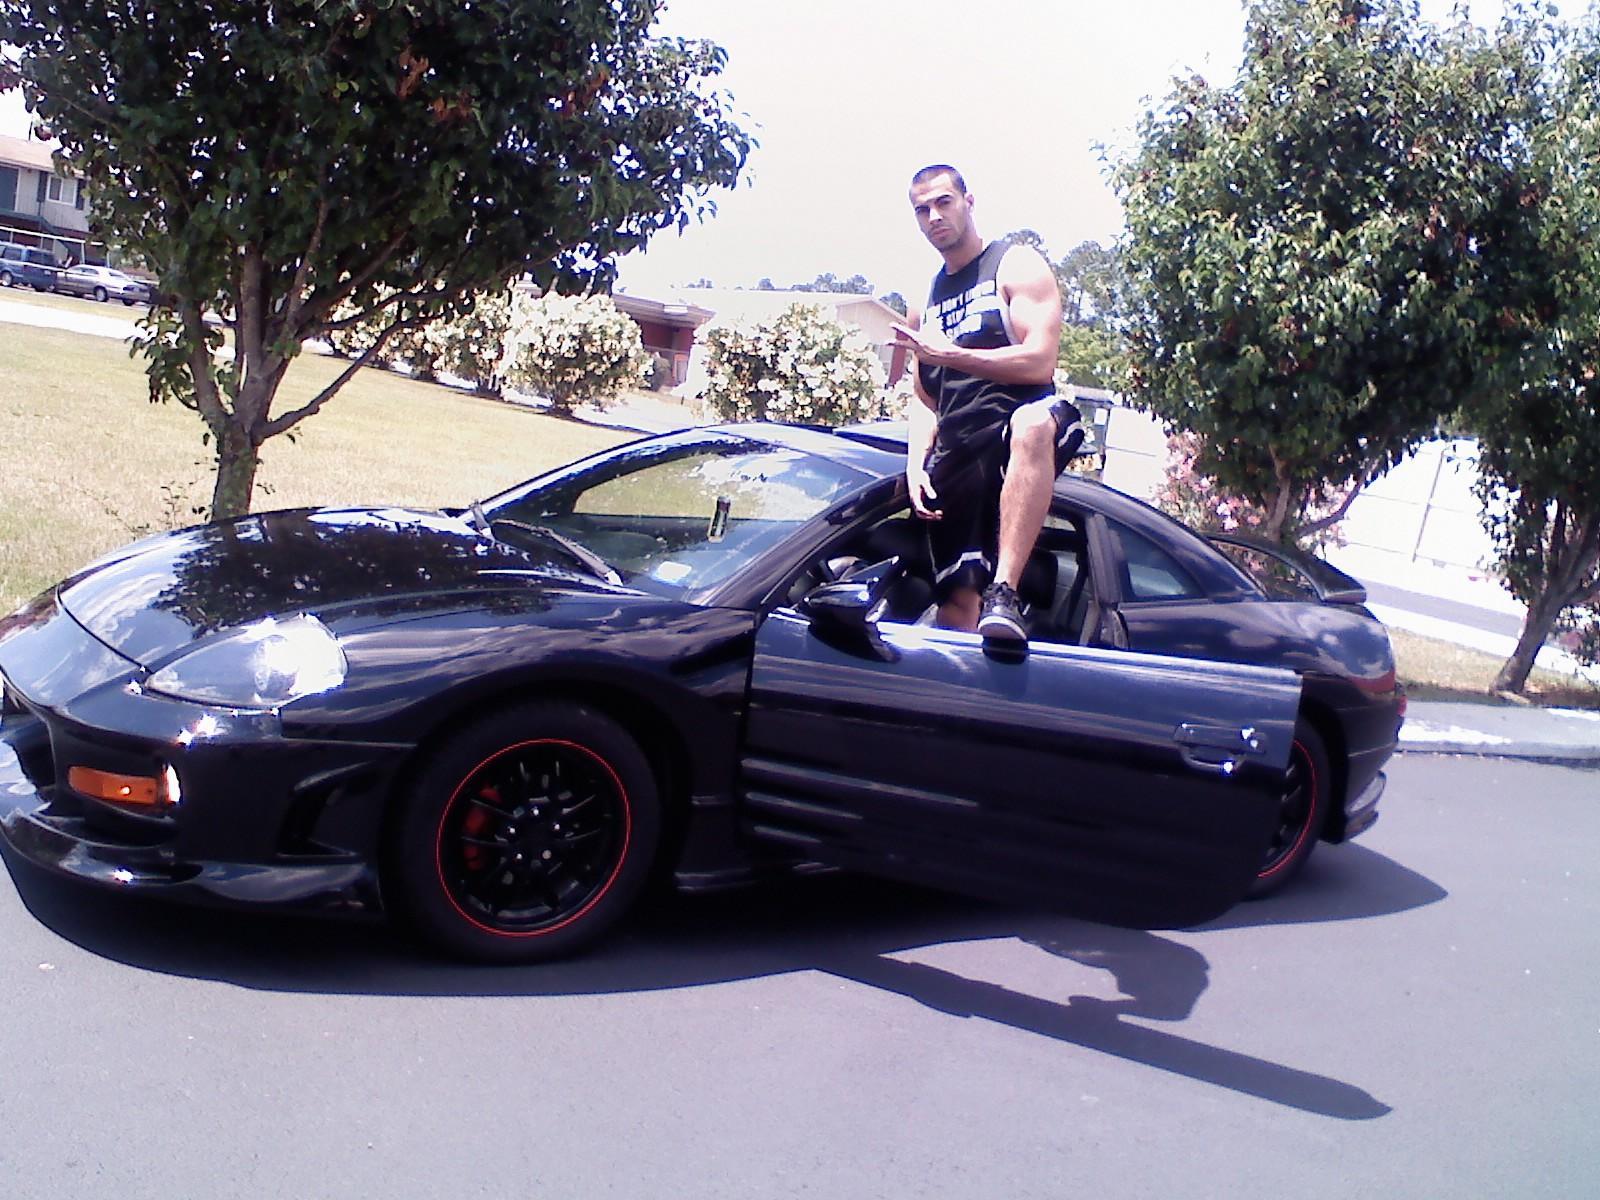 Me & My Ride!